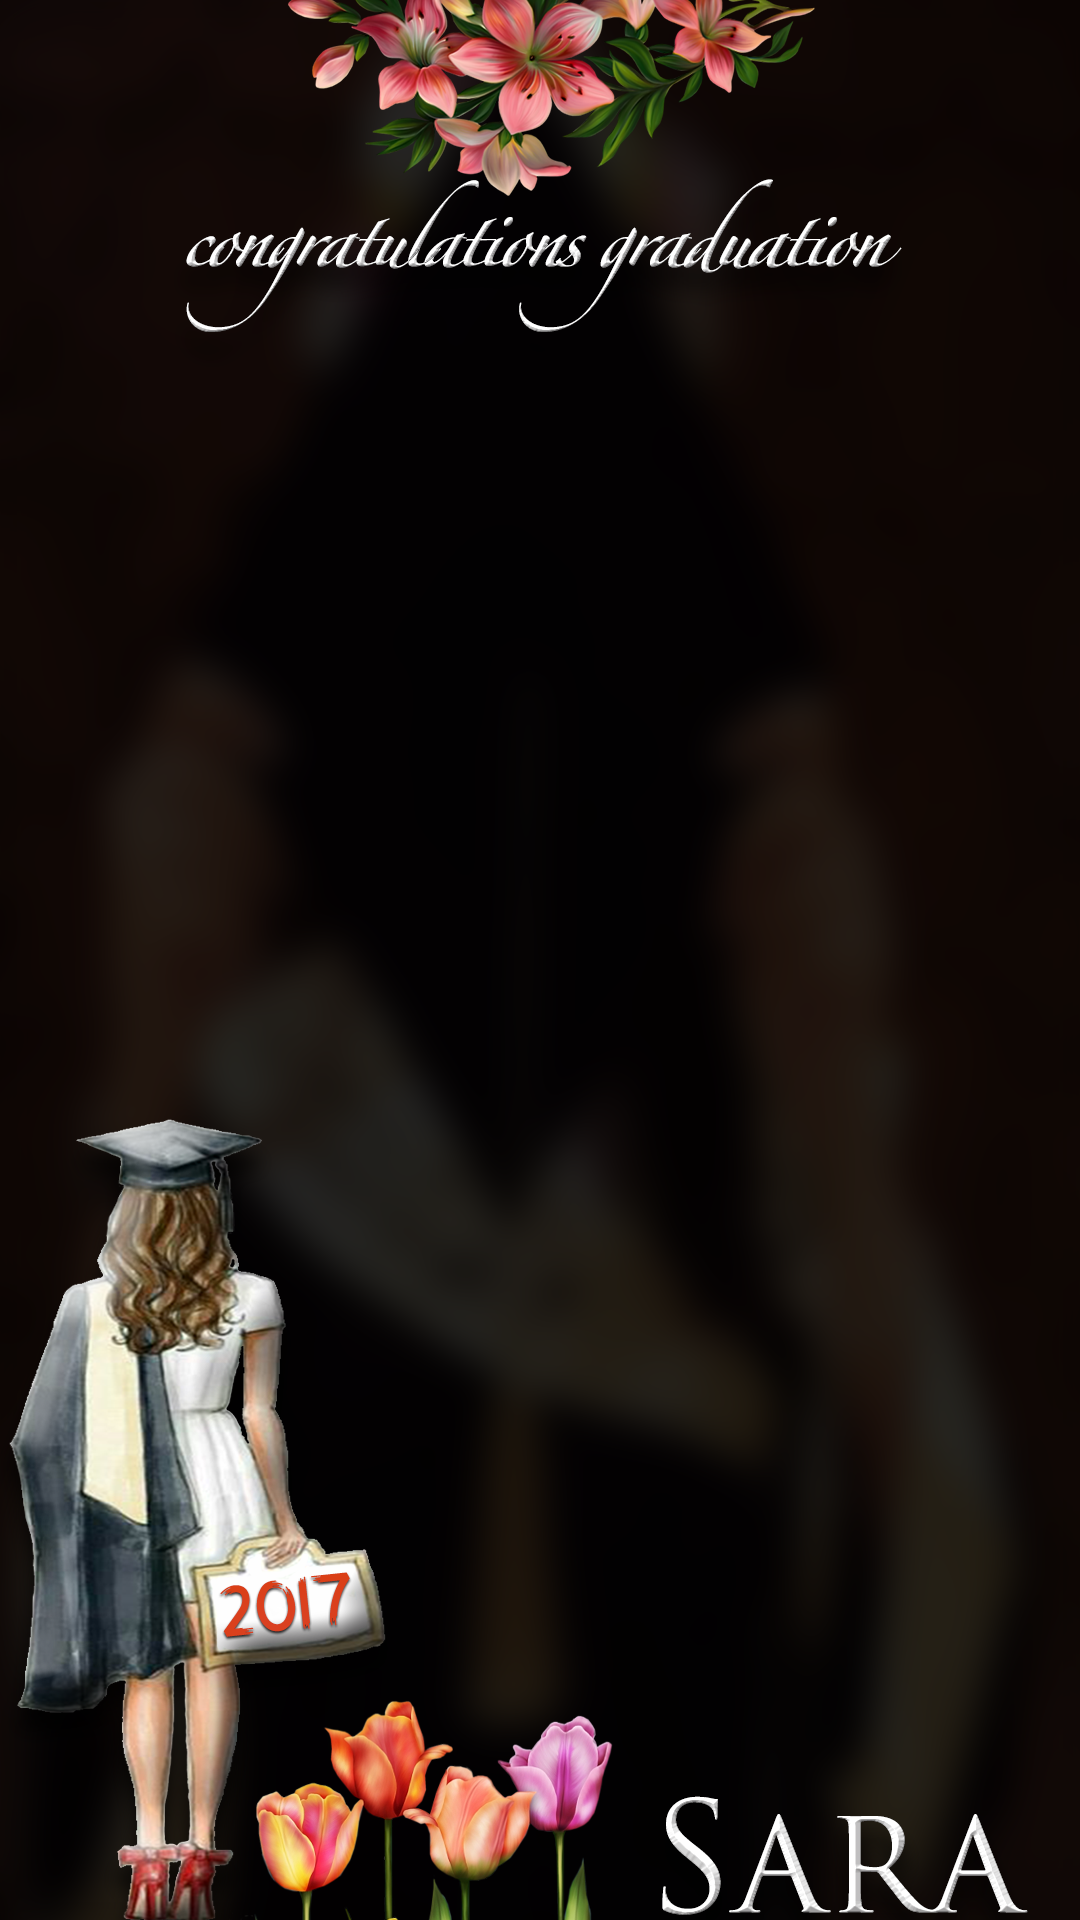 فلتر تخرج احترافي لعام 2018 لتصميم فلاتر سناب شات فلتر تخرج فلاتر فلتر خاص فلتر زواج Graduation Images Graduation Party Diy Graduation Party Centerpieces